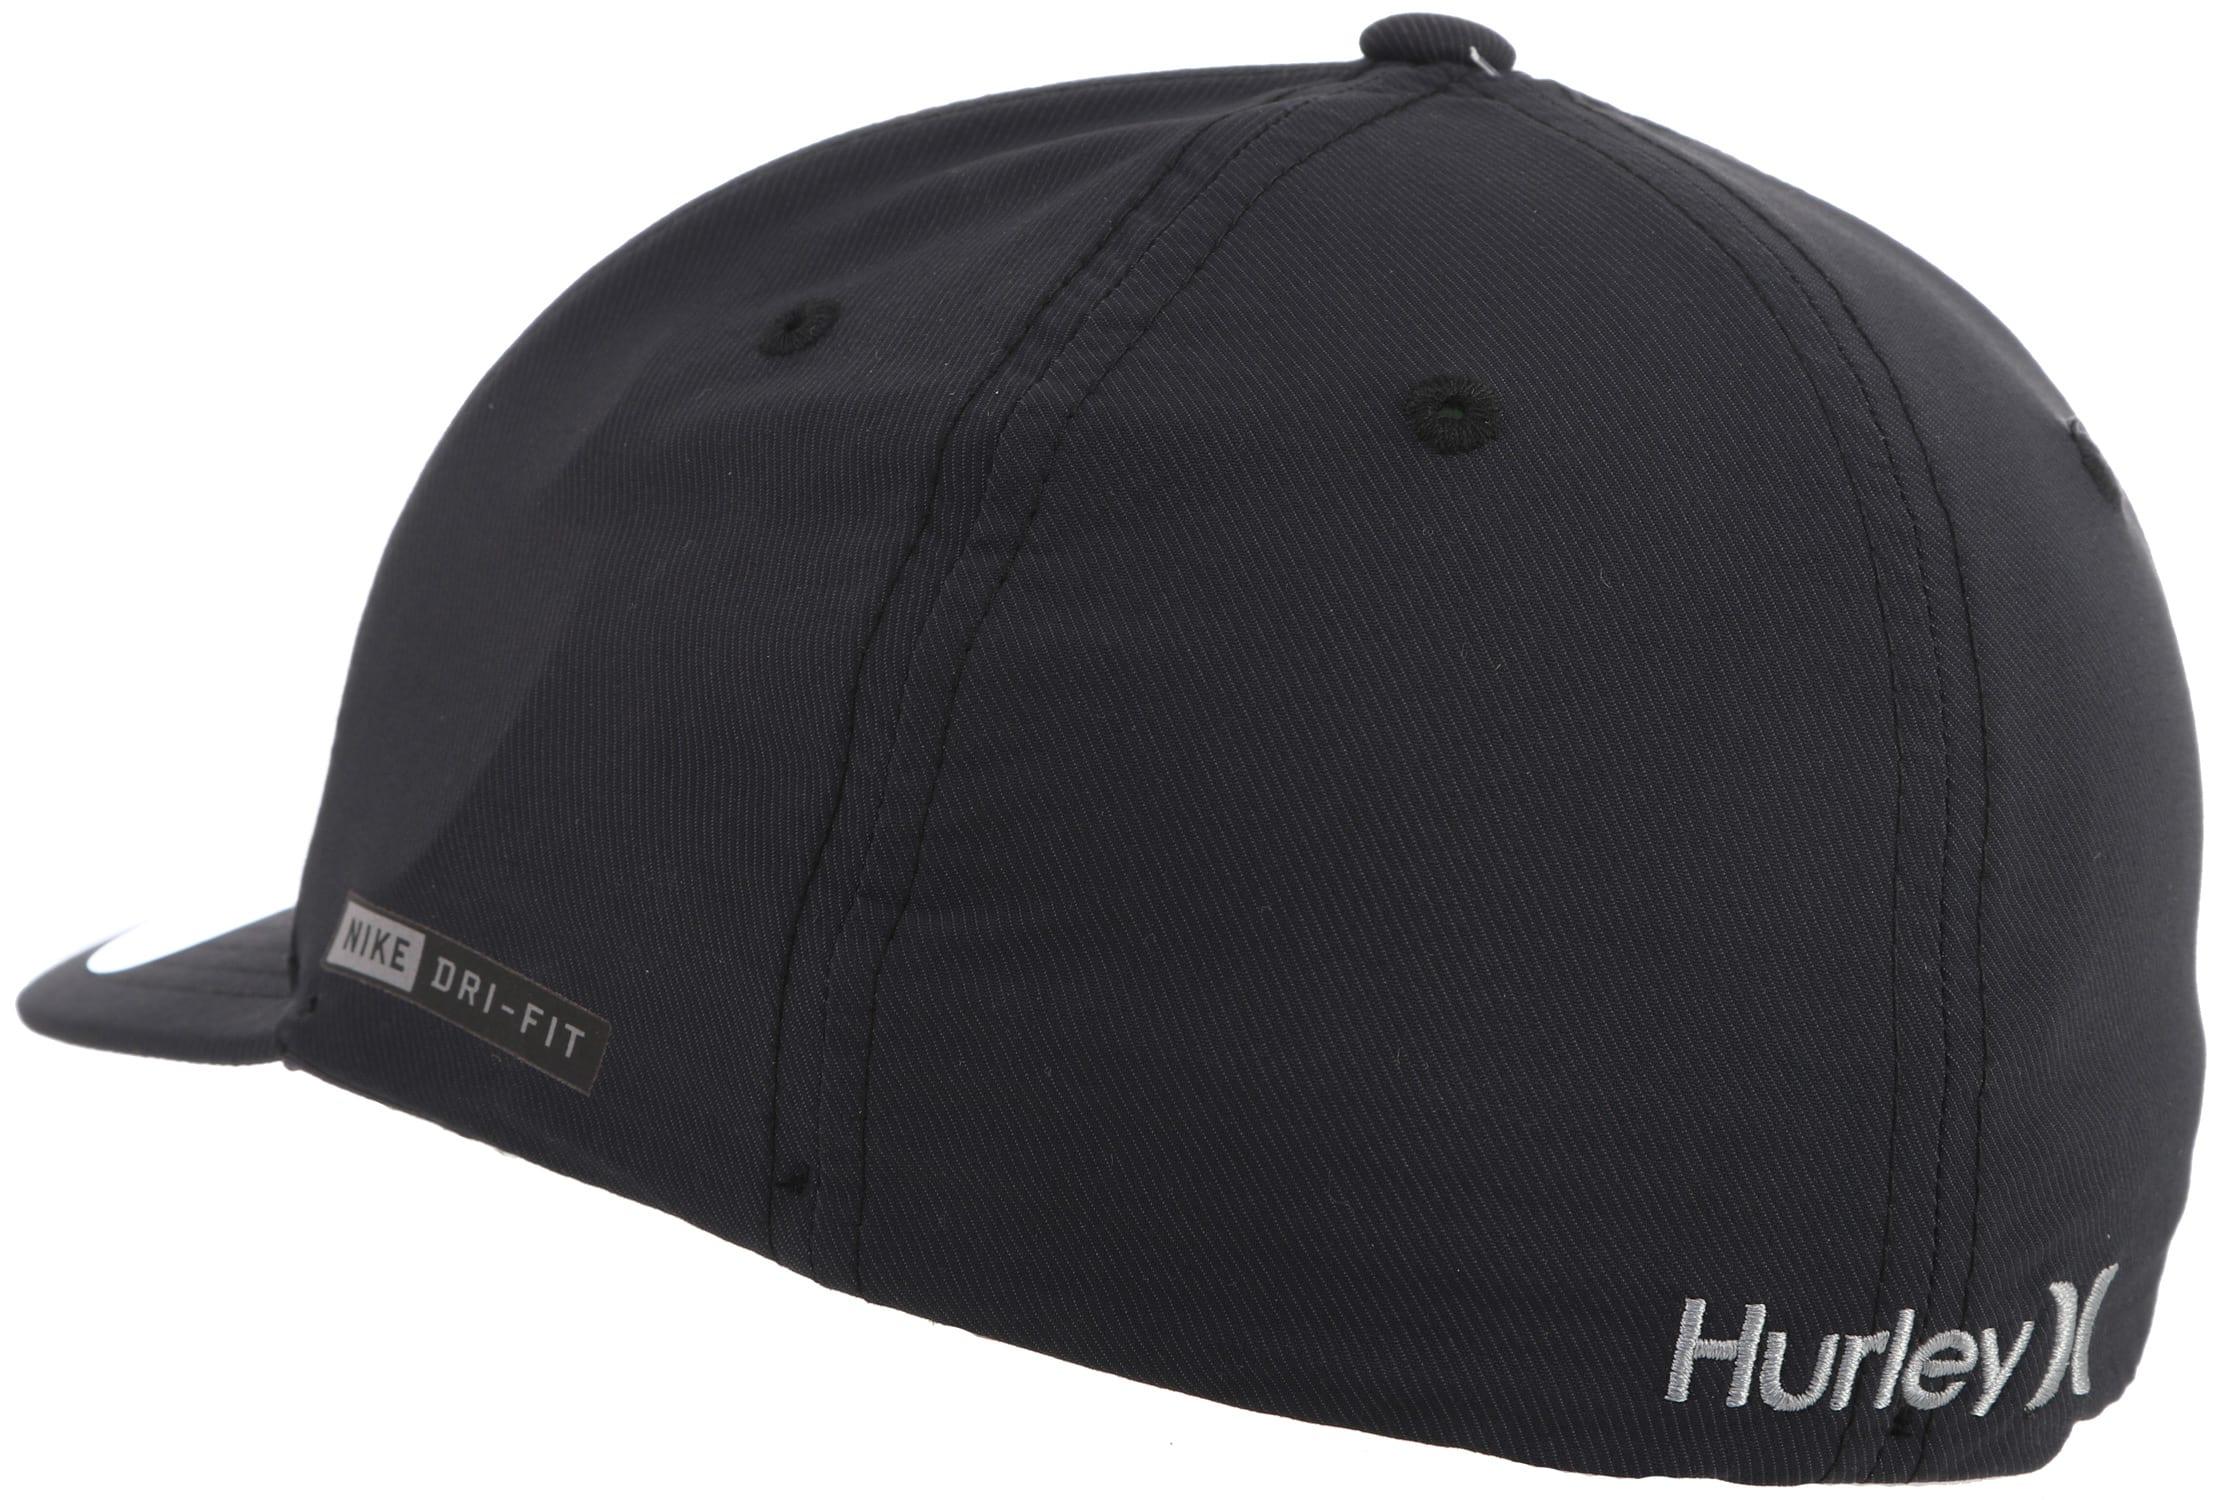 watch 308a9 2fd20 ... shop hurley dri fit outline 2.0 cap thumbnail 3 2e524 2a188 ...